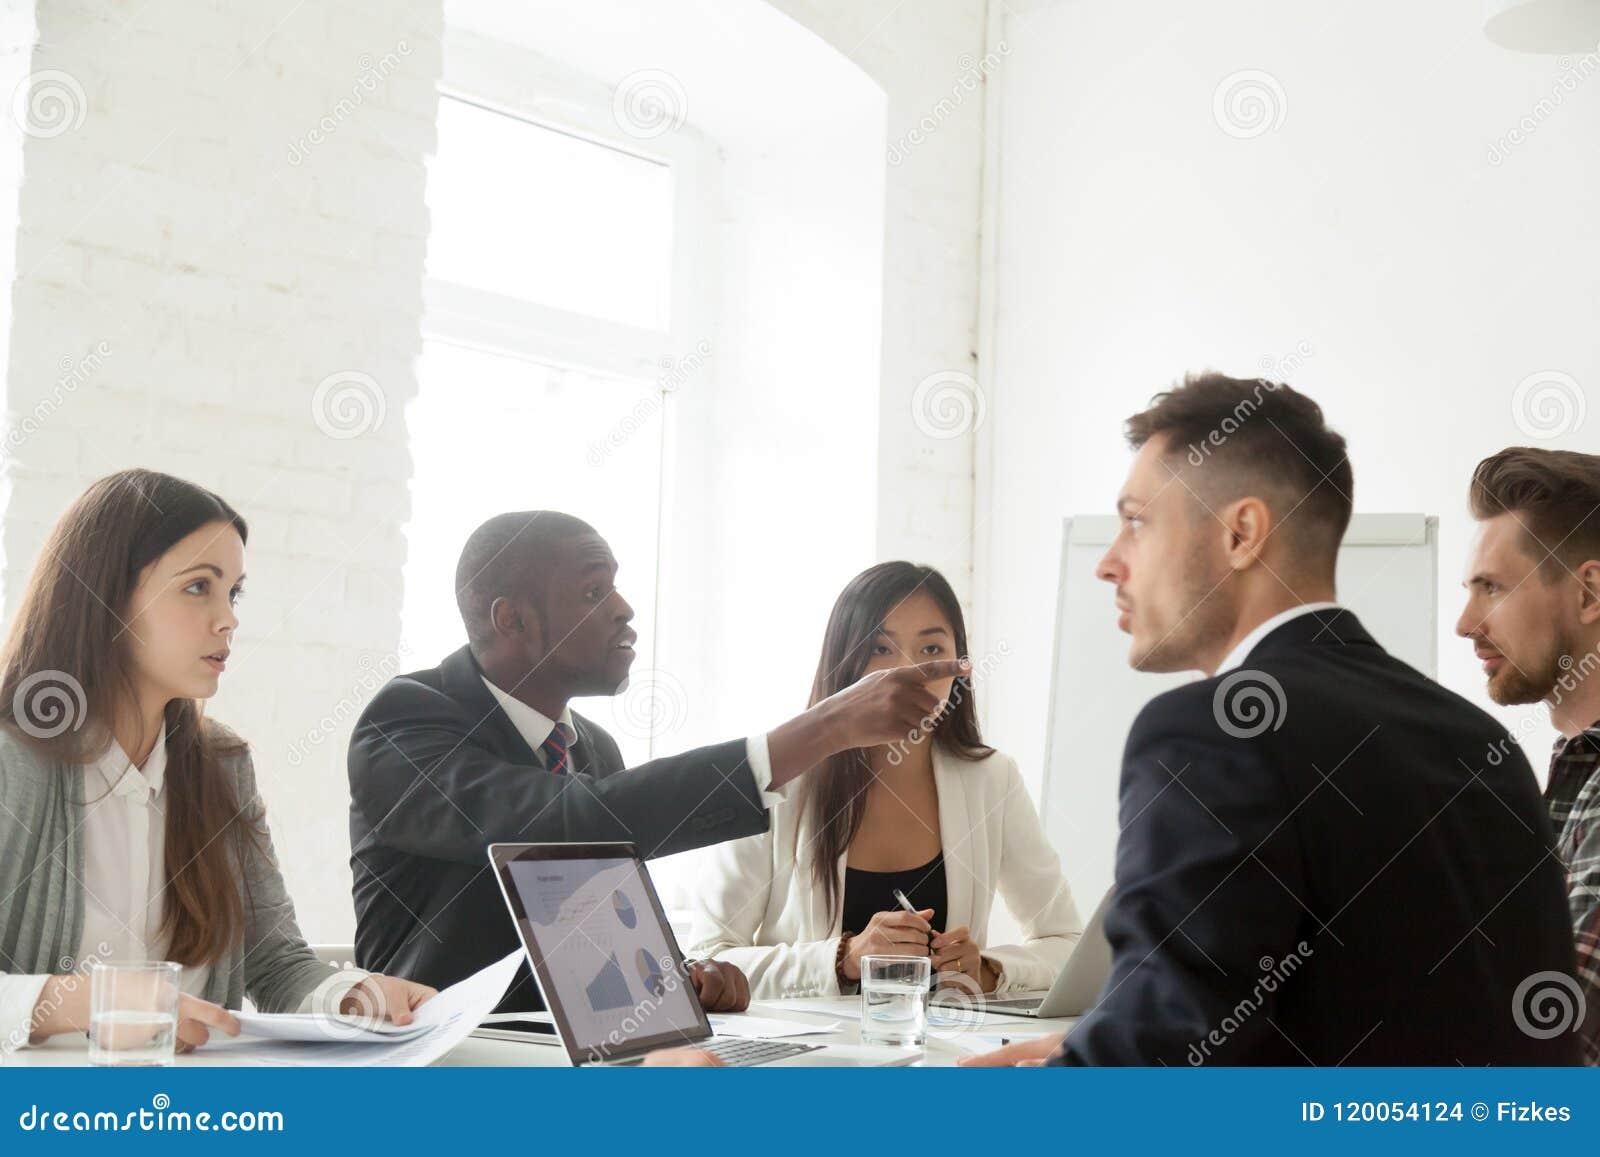 Diverse colleagues disputing during work meeting